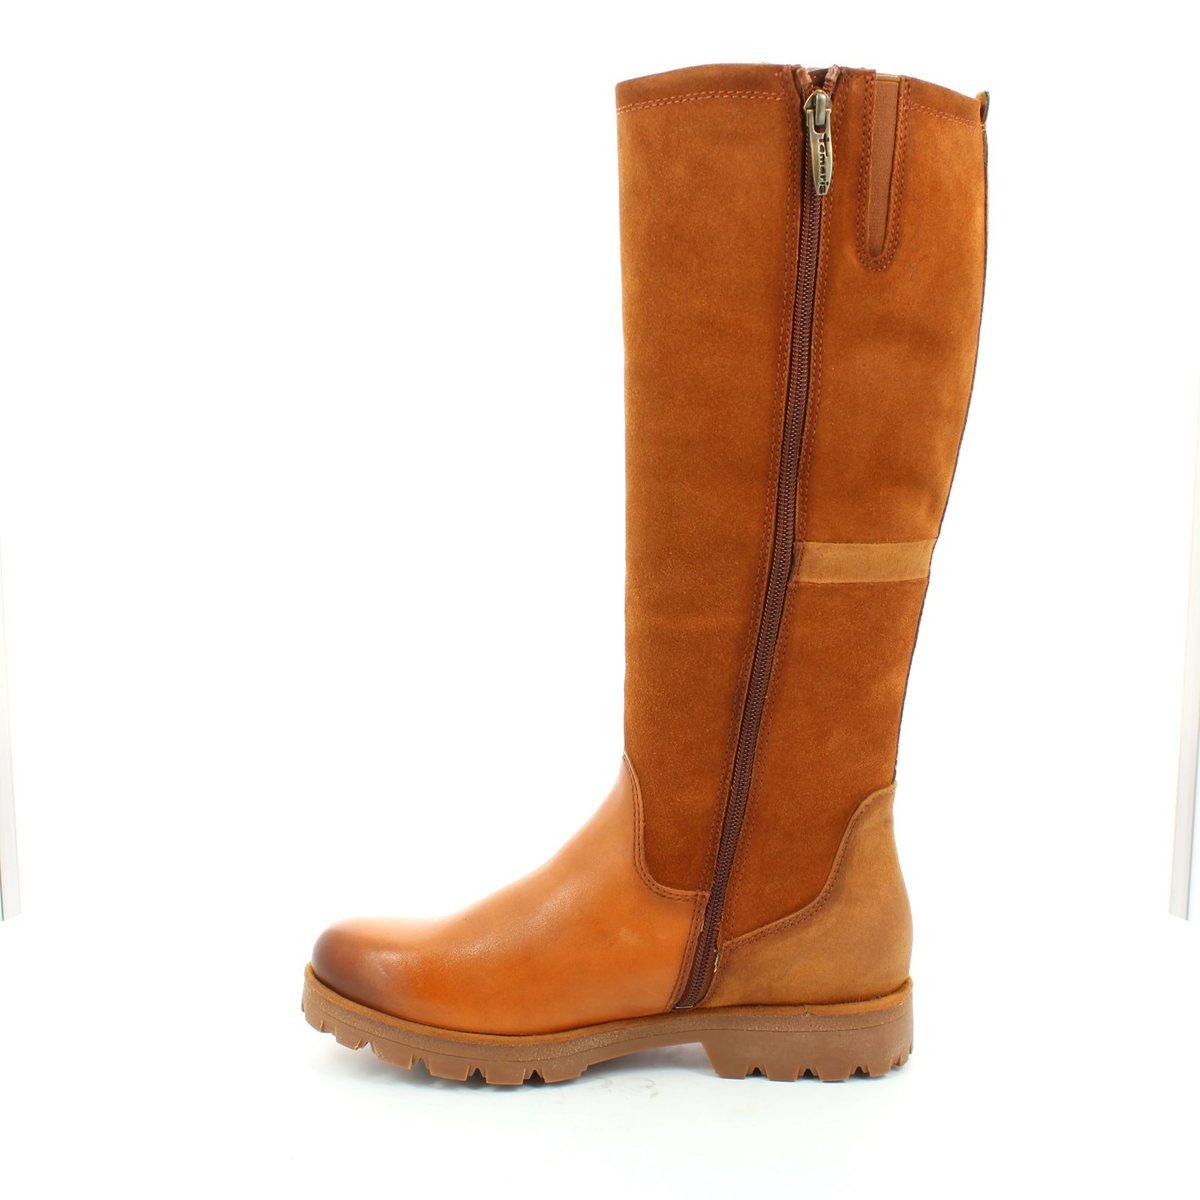 tamaris angelana 25600 392 tan knee high boots. Black Bedroom Furniture Sets. Home Design Ideas